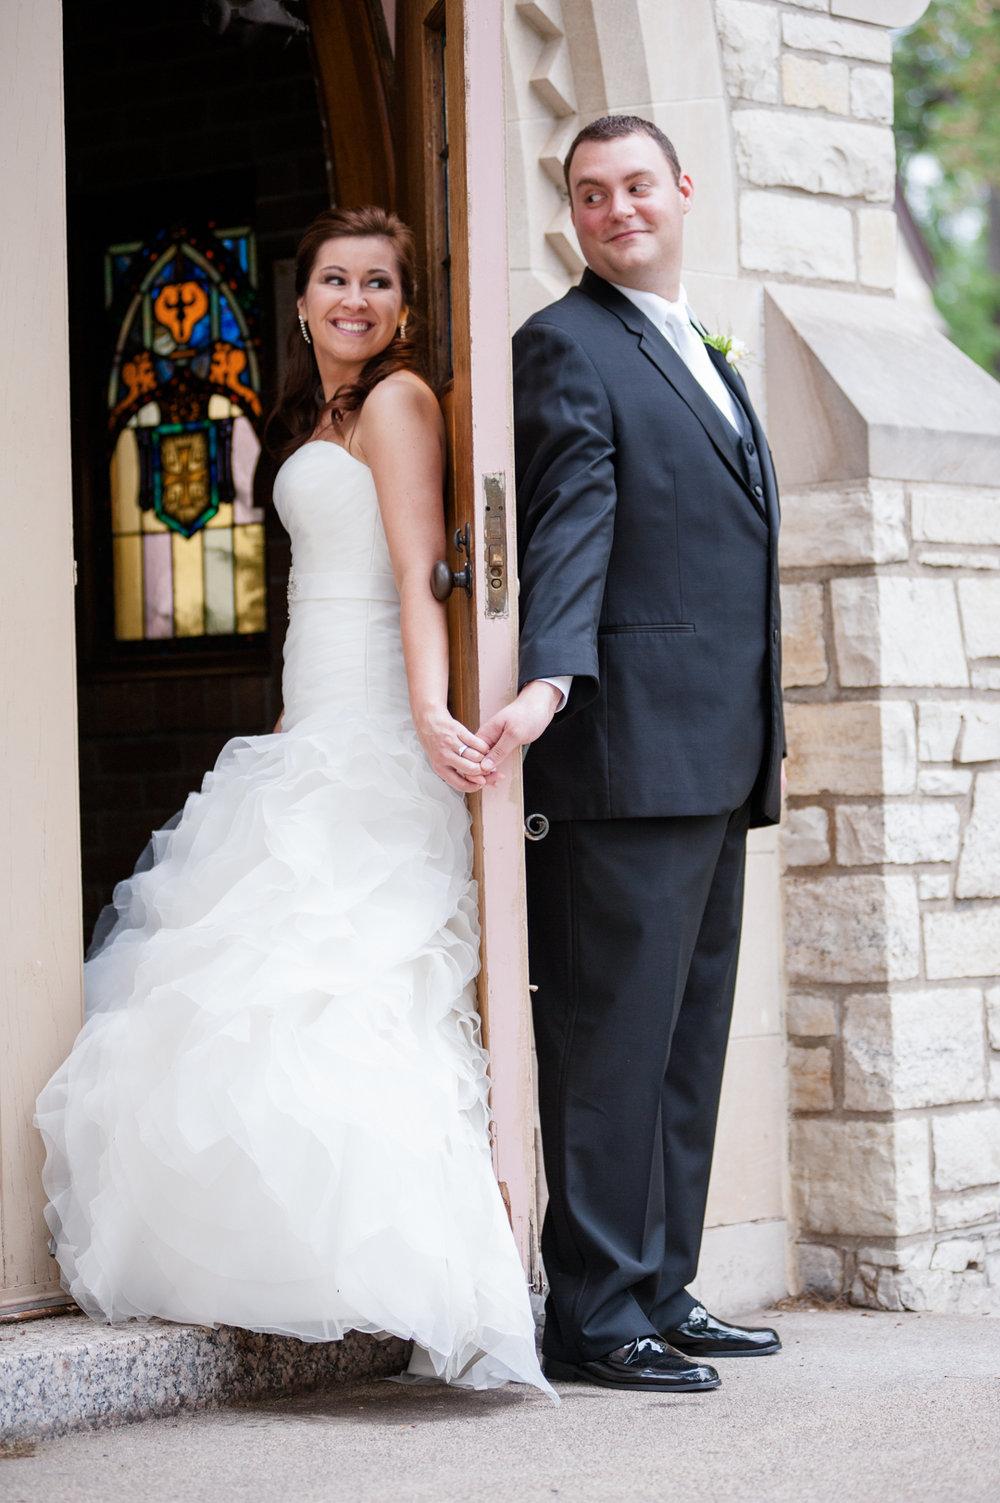 TerraSura-Weddings-Web-5250.jpg